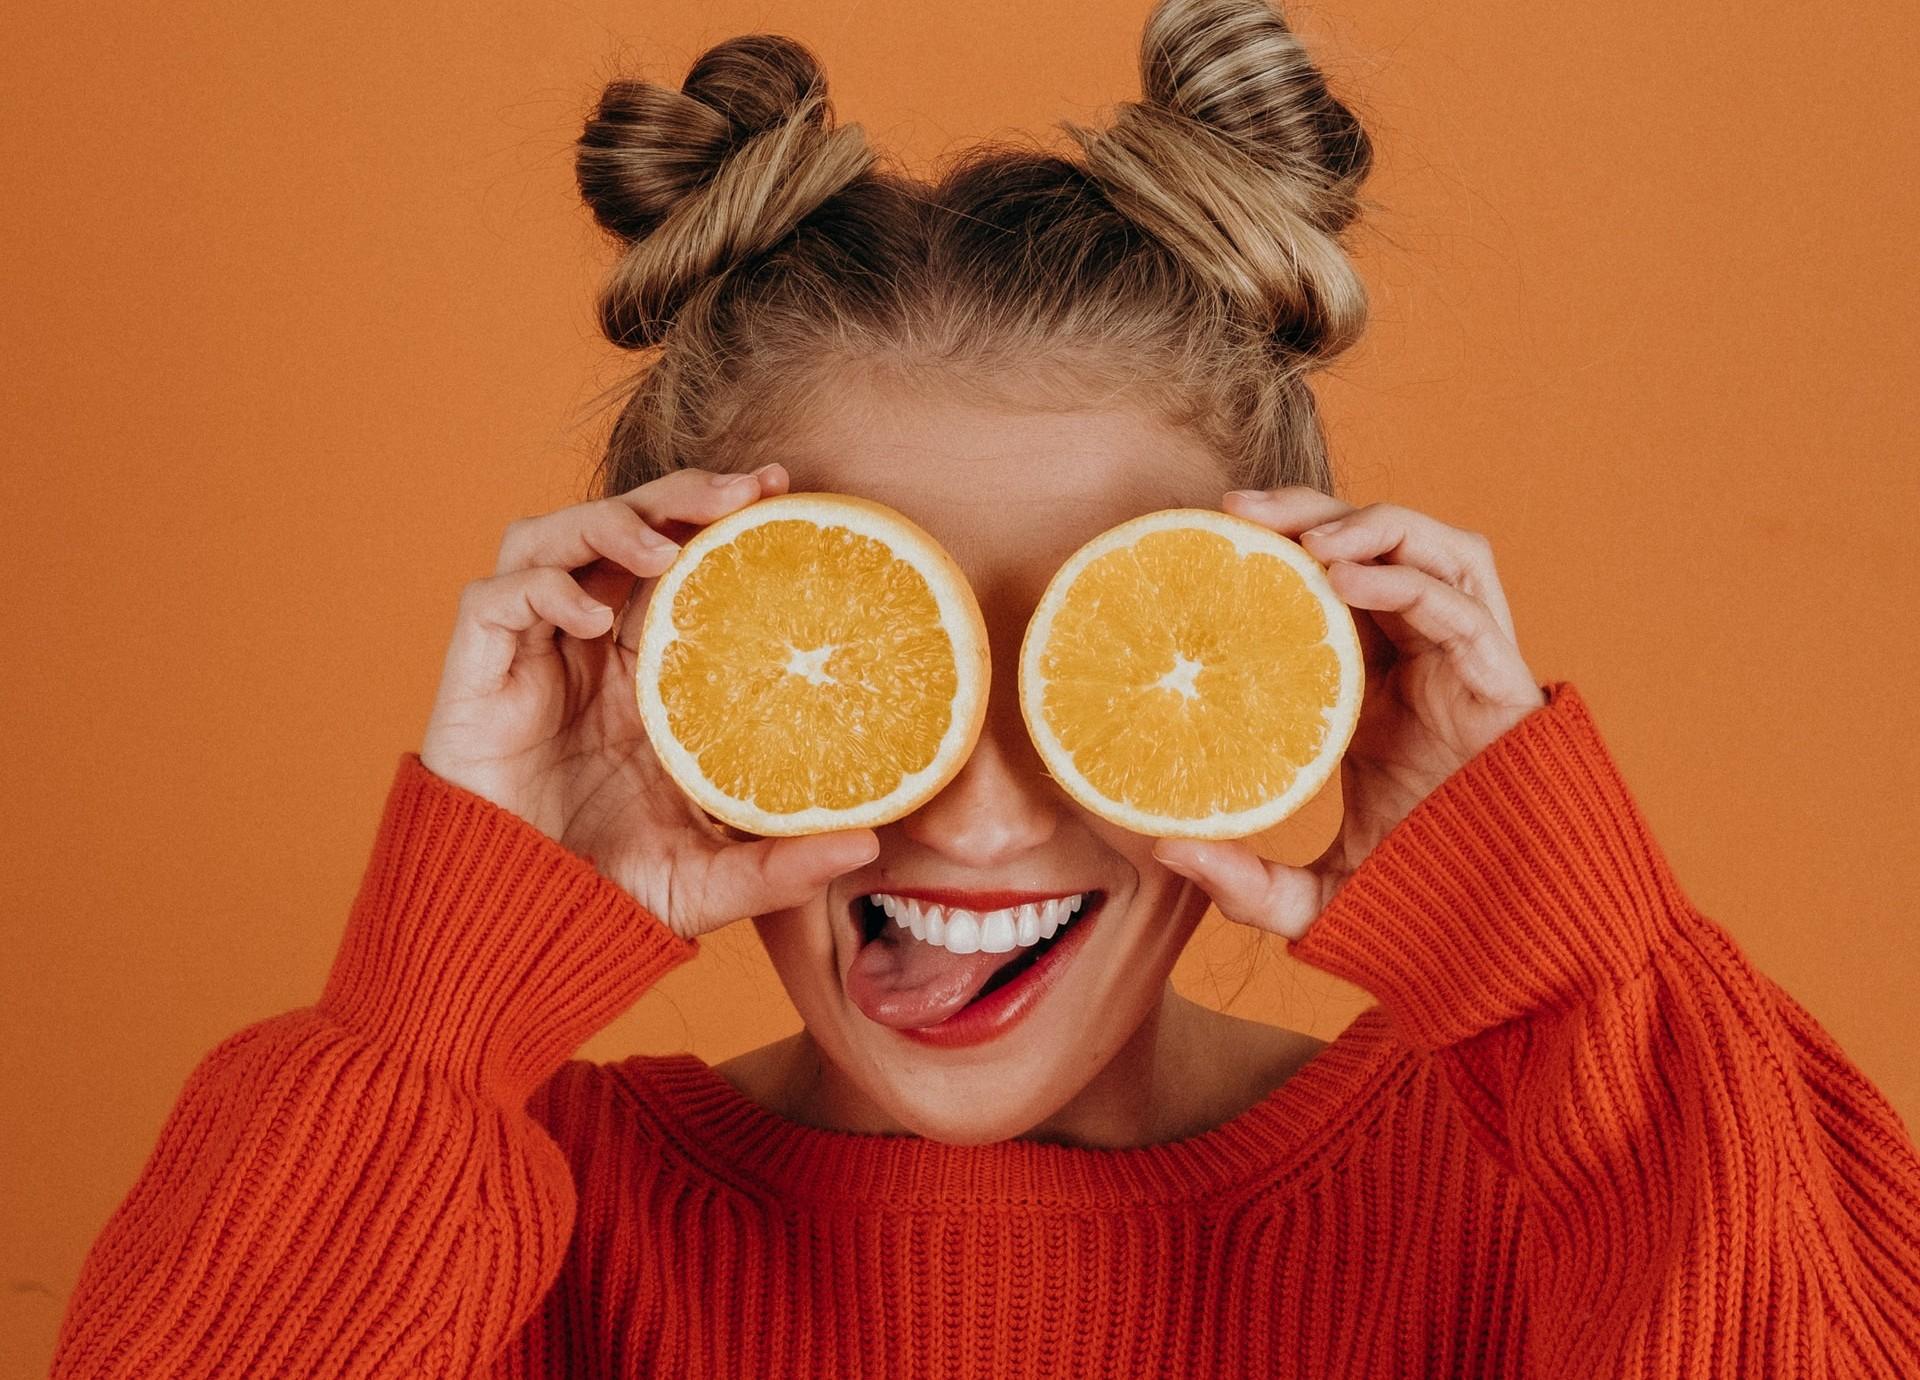 vitamin-c-skincare-benefits